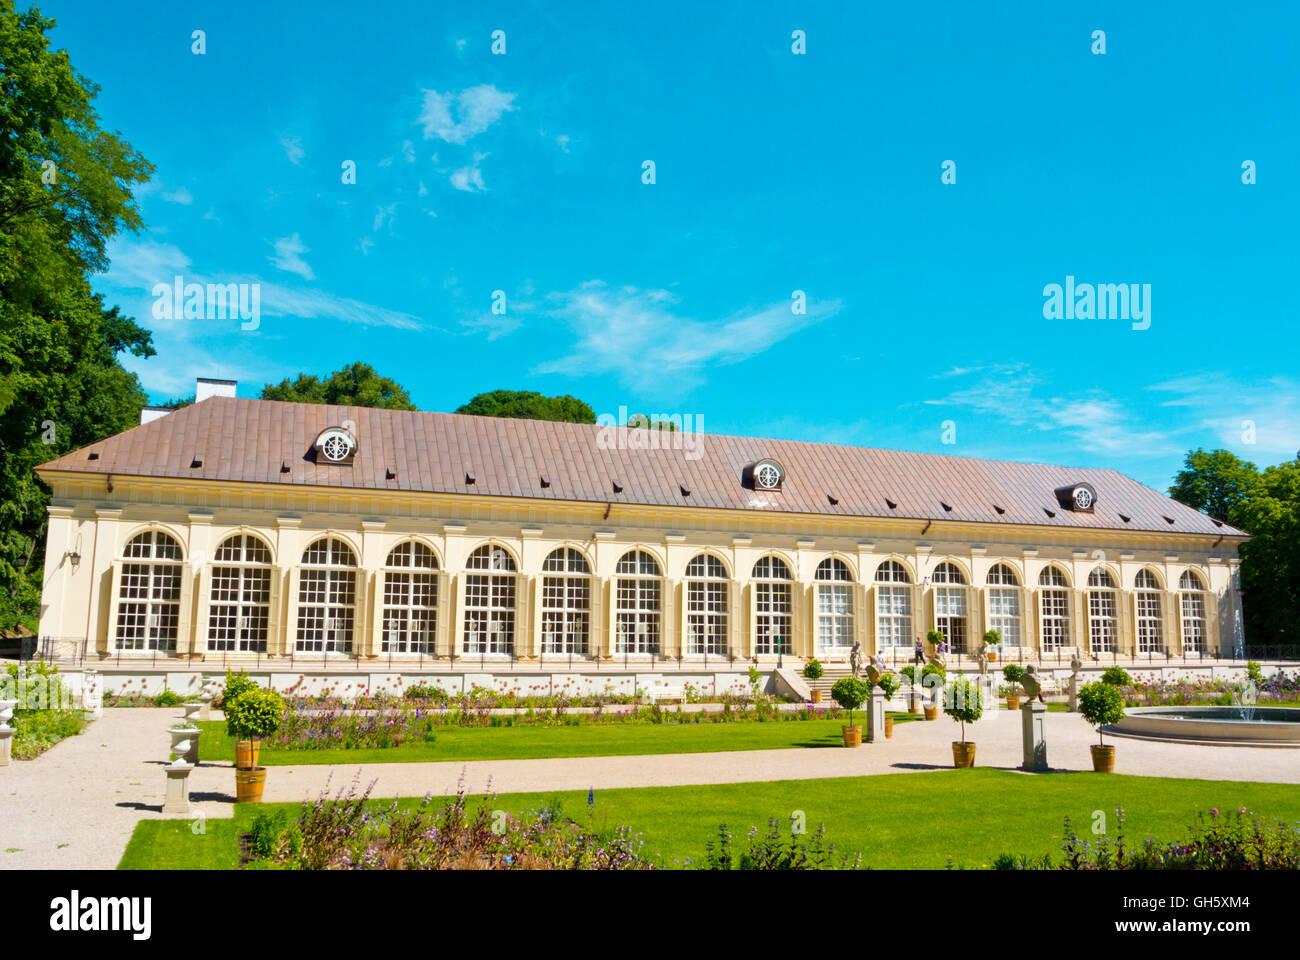 Stara Pomaranczarnia Old Orangery Building Lazienki